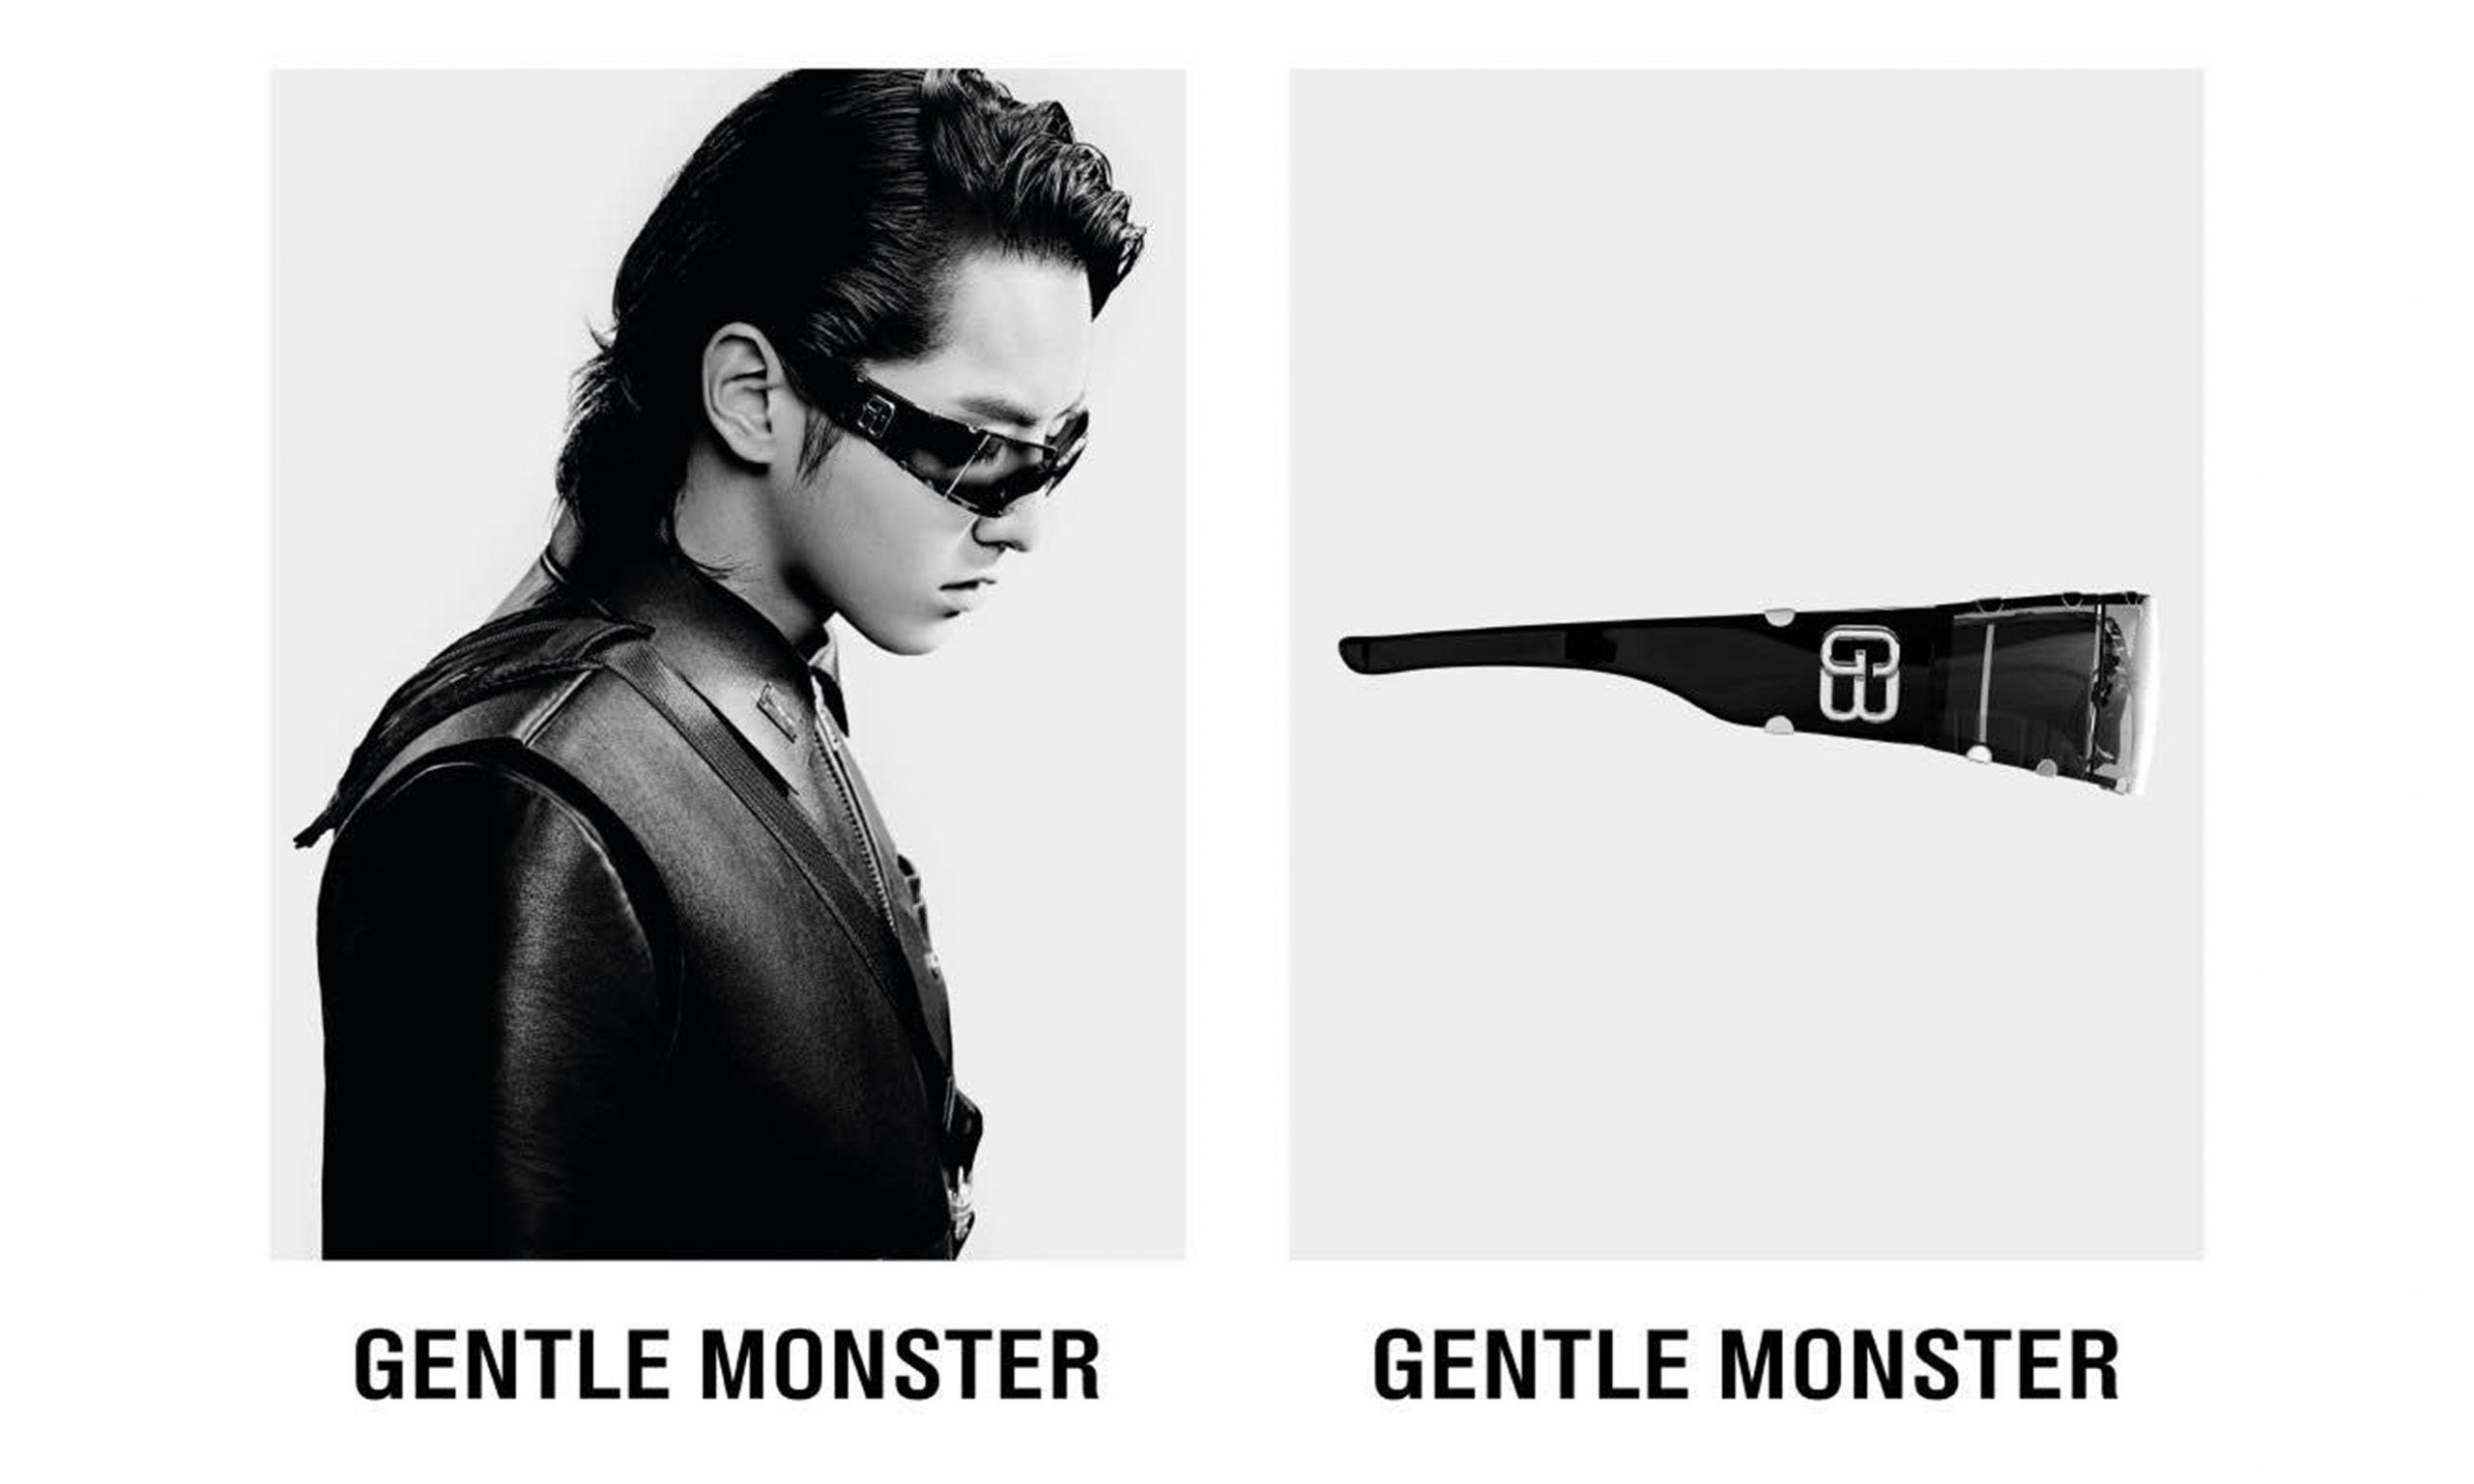 GENTLE MONSTER 联合吴亦凡 推出「GENTLE WU」合作系列